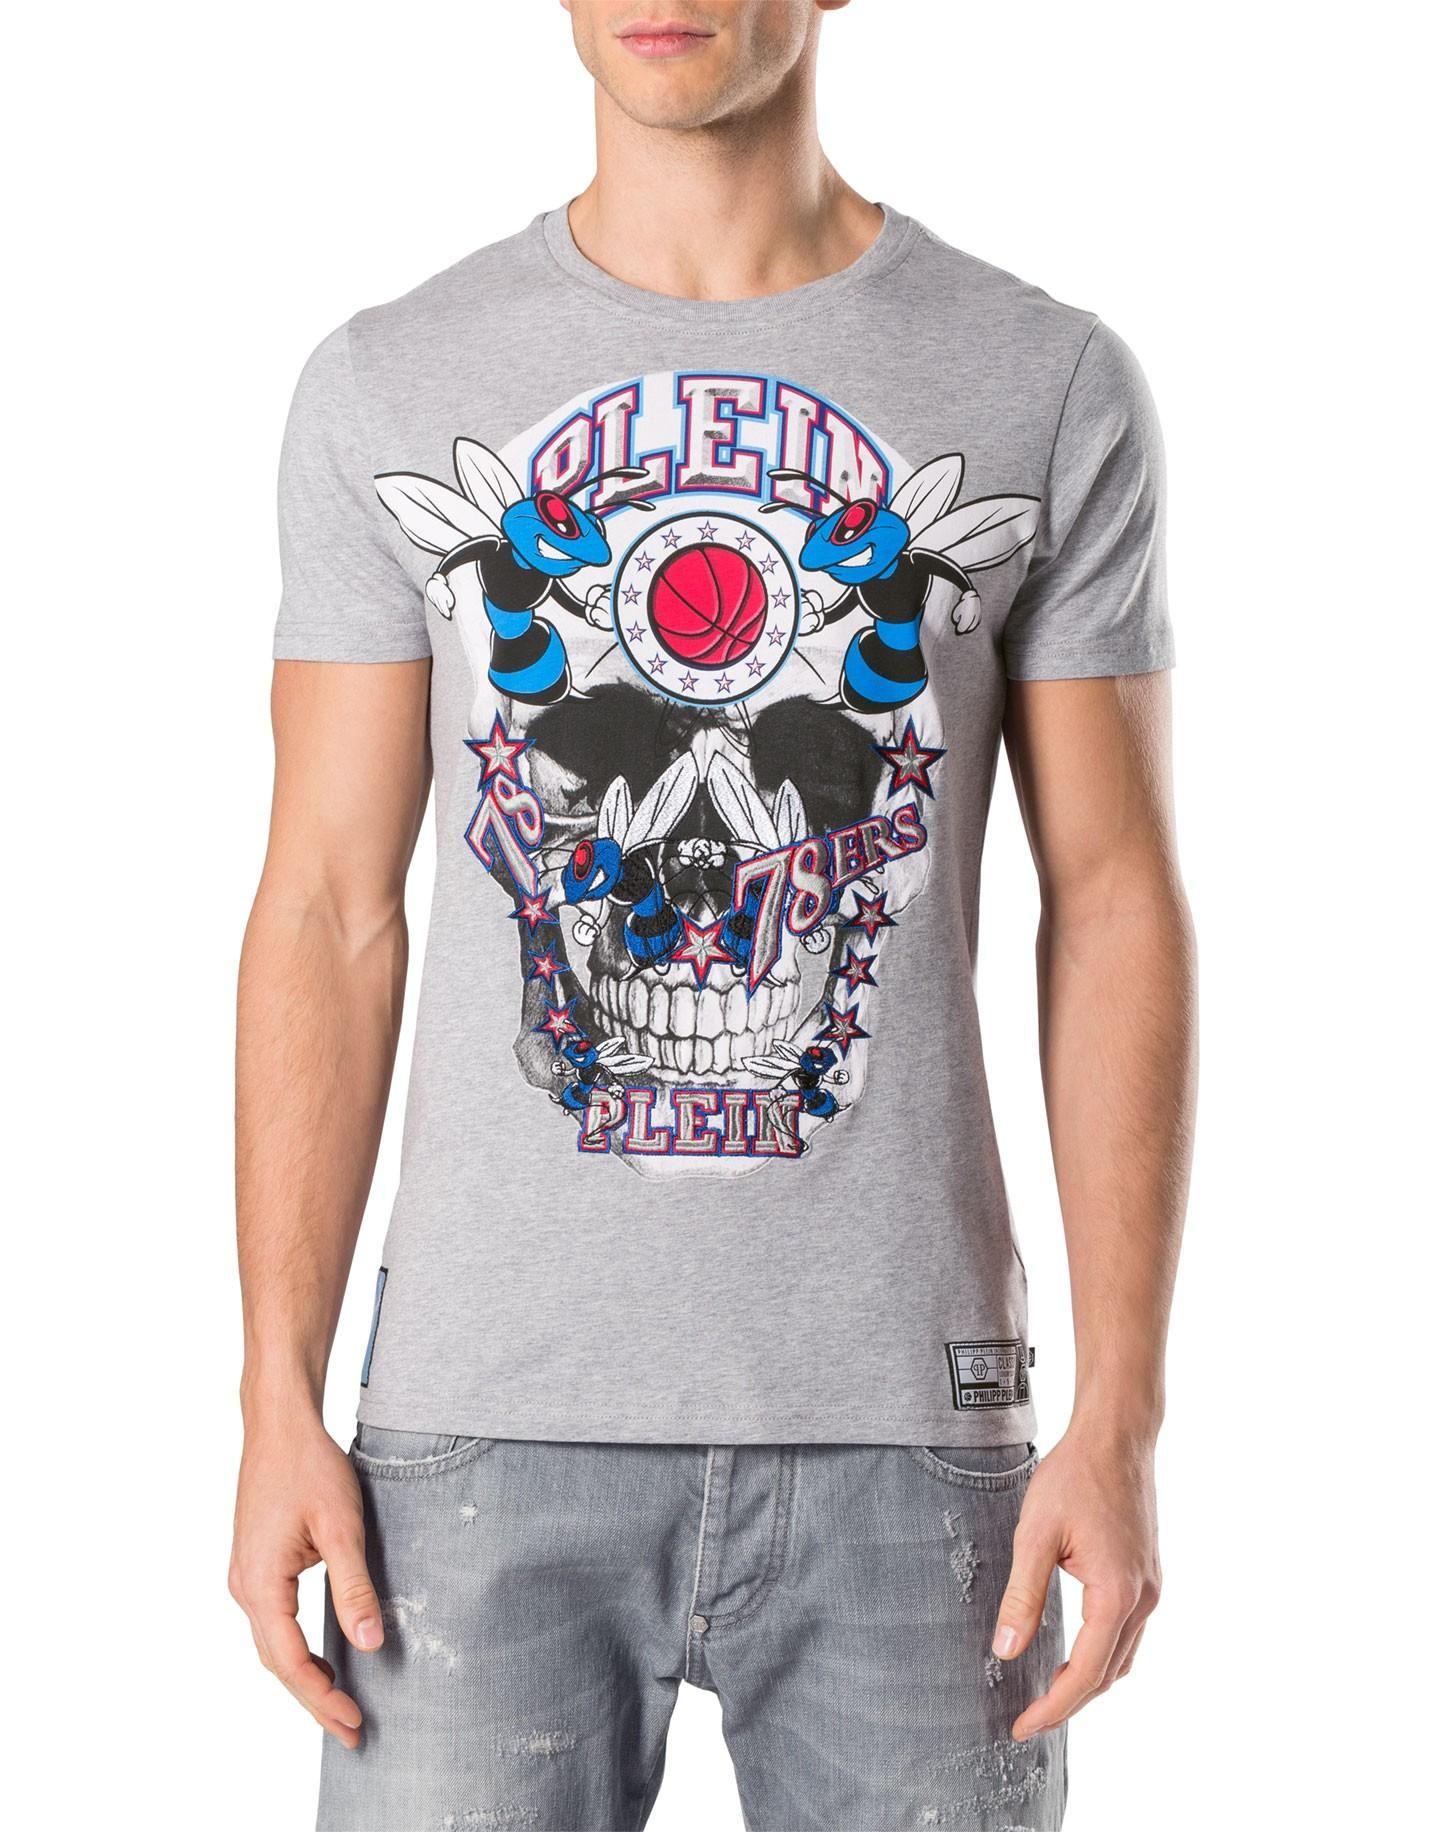 T shirt design 2 zeixs - 2017 Cotton Diamonds T Shirts Designer Mens Skulls U0026 Bears All